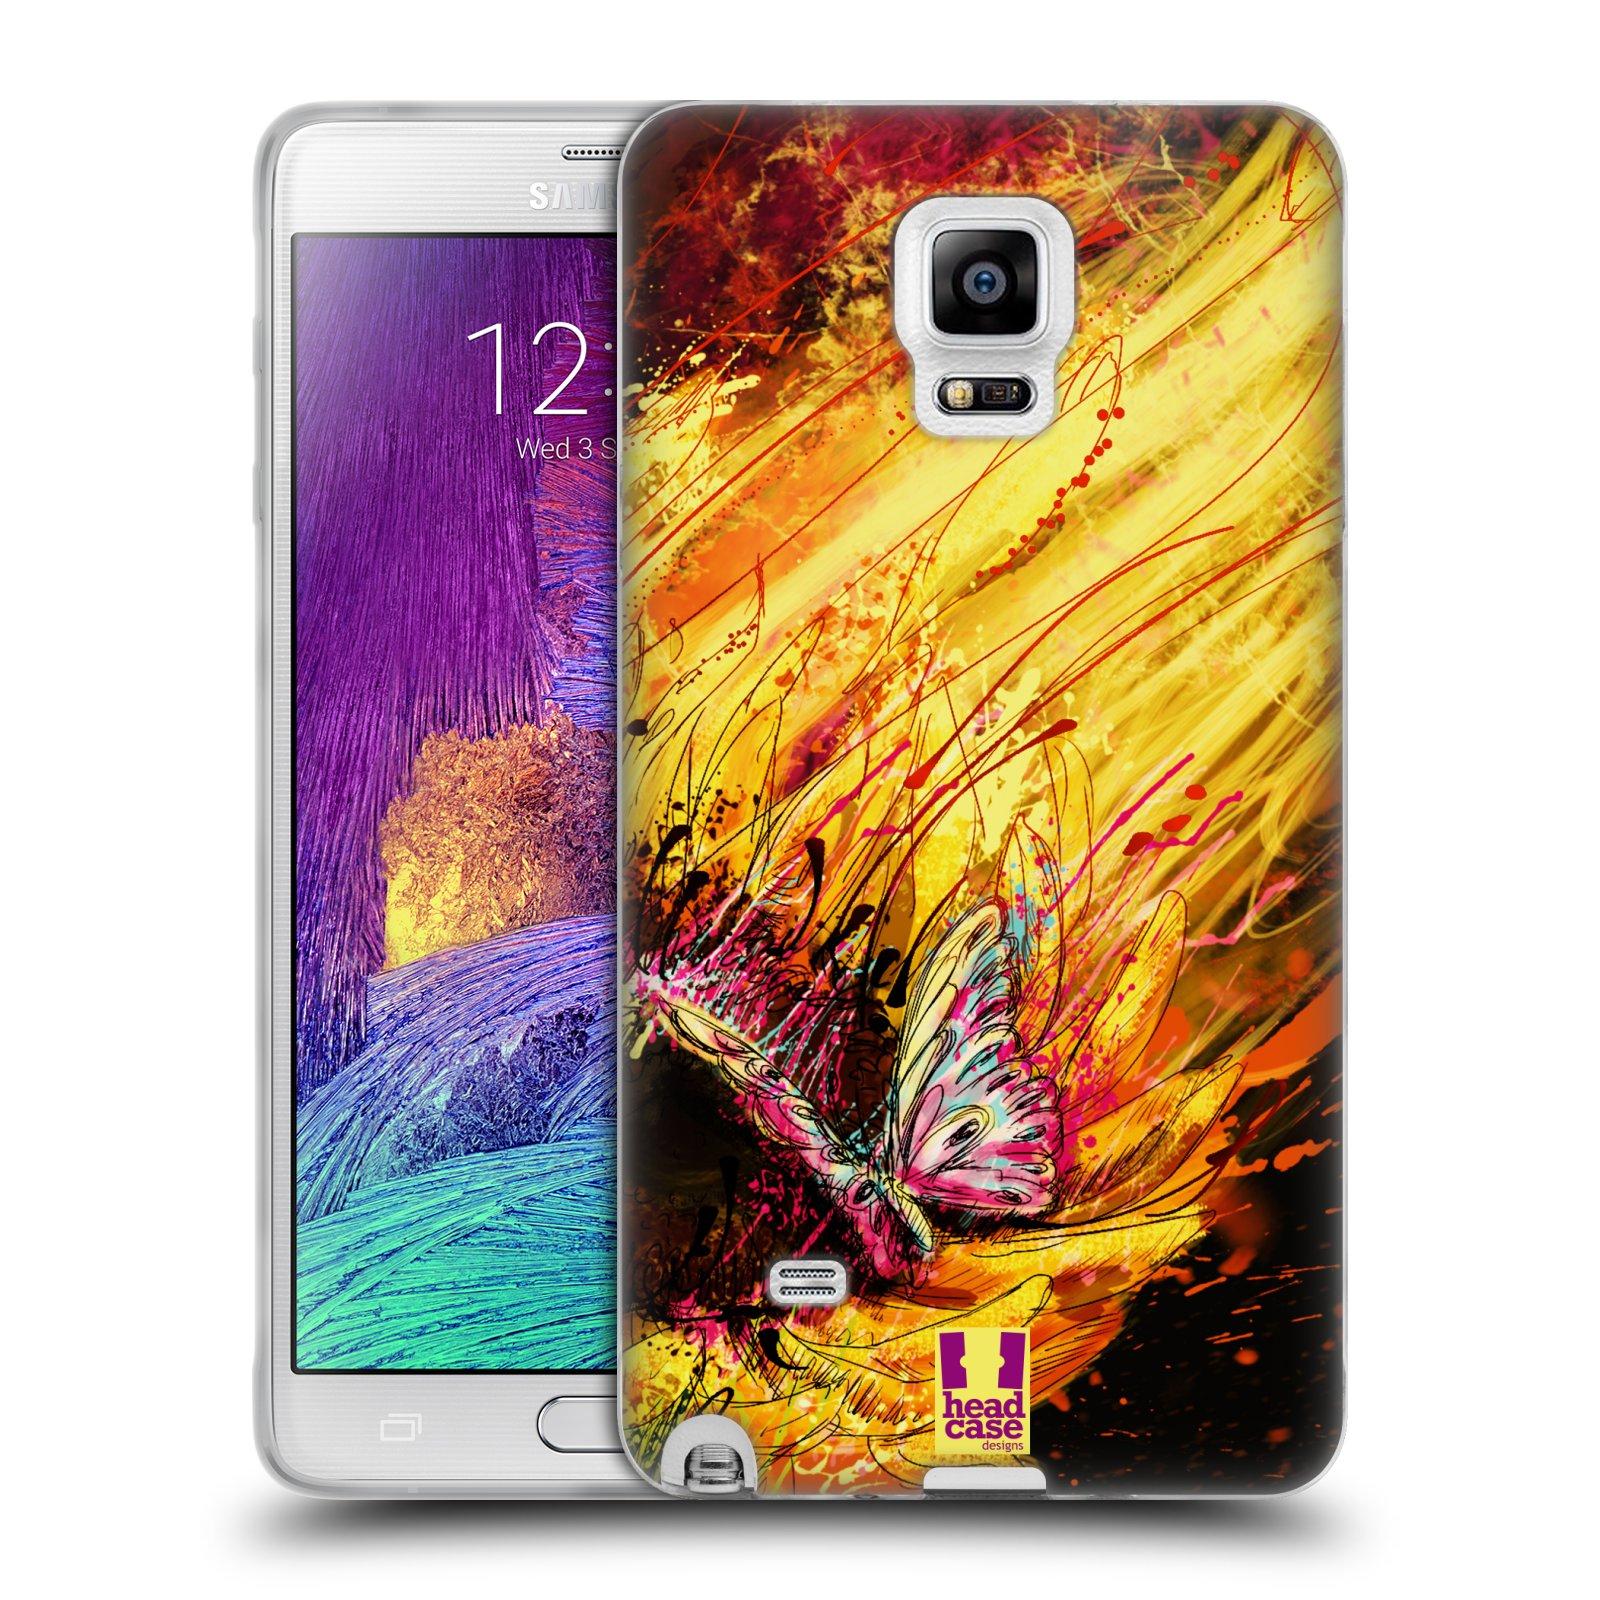 HEAD CASE silikonový obal na mobil Samsung Galaxy Note 4 (N910) vzor Kreslené barevné květiny SLUNEČNICE